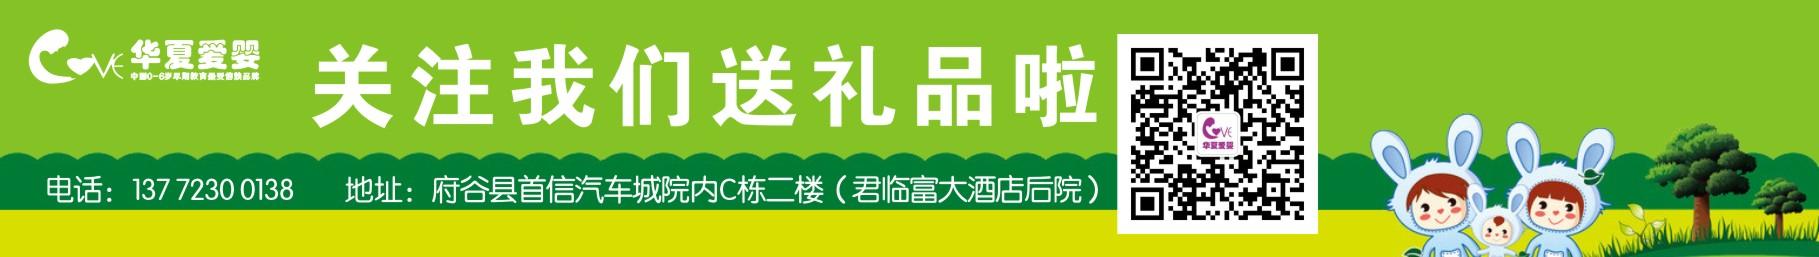 http://p2.pccoo.cn/vote/20150330/2015033010194009702070.jpg